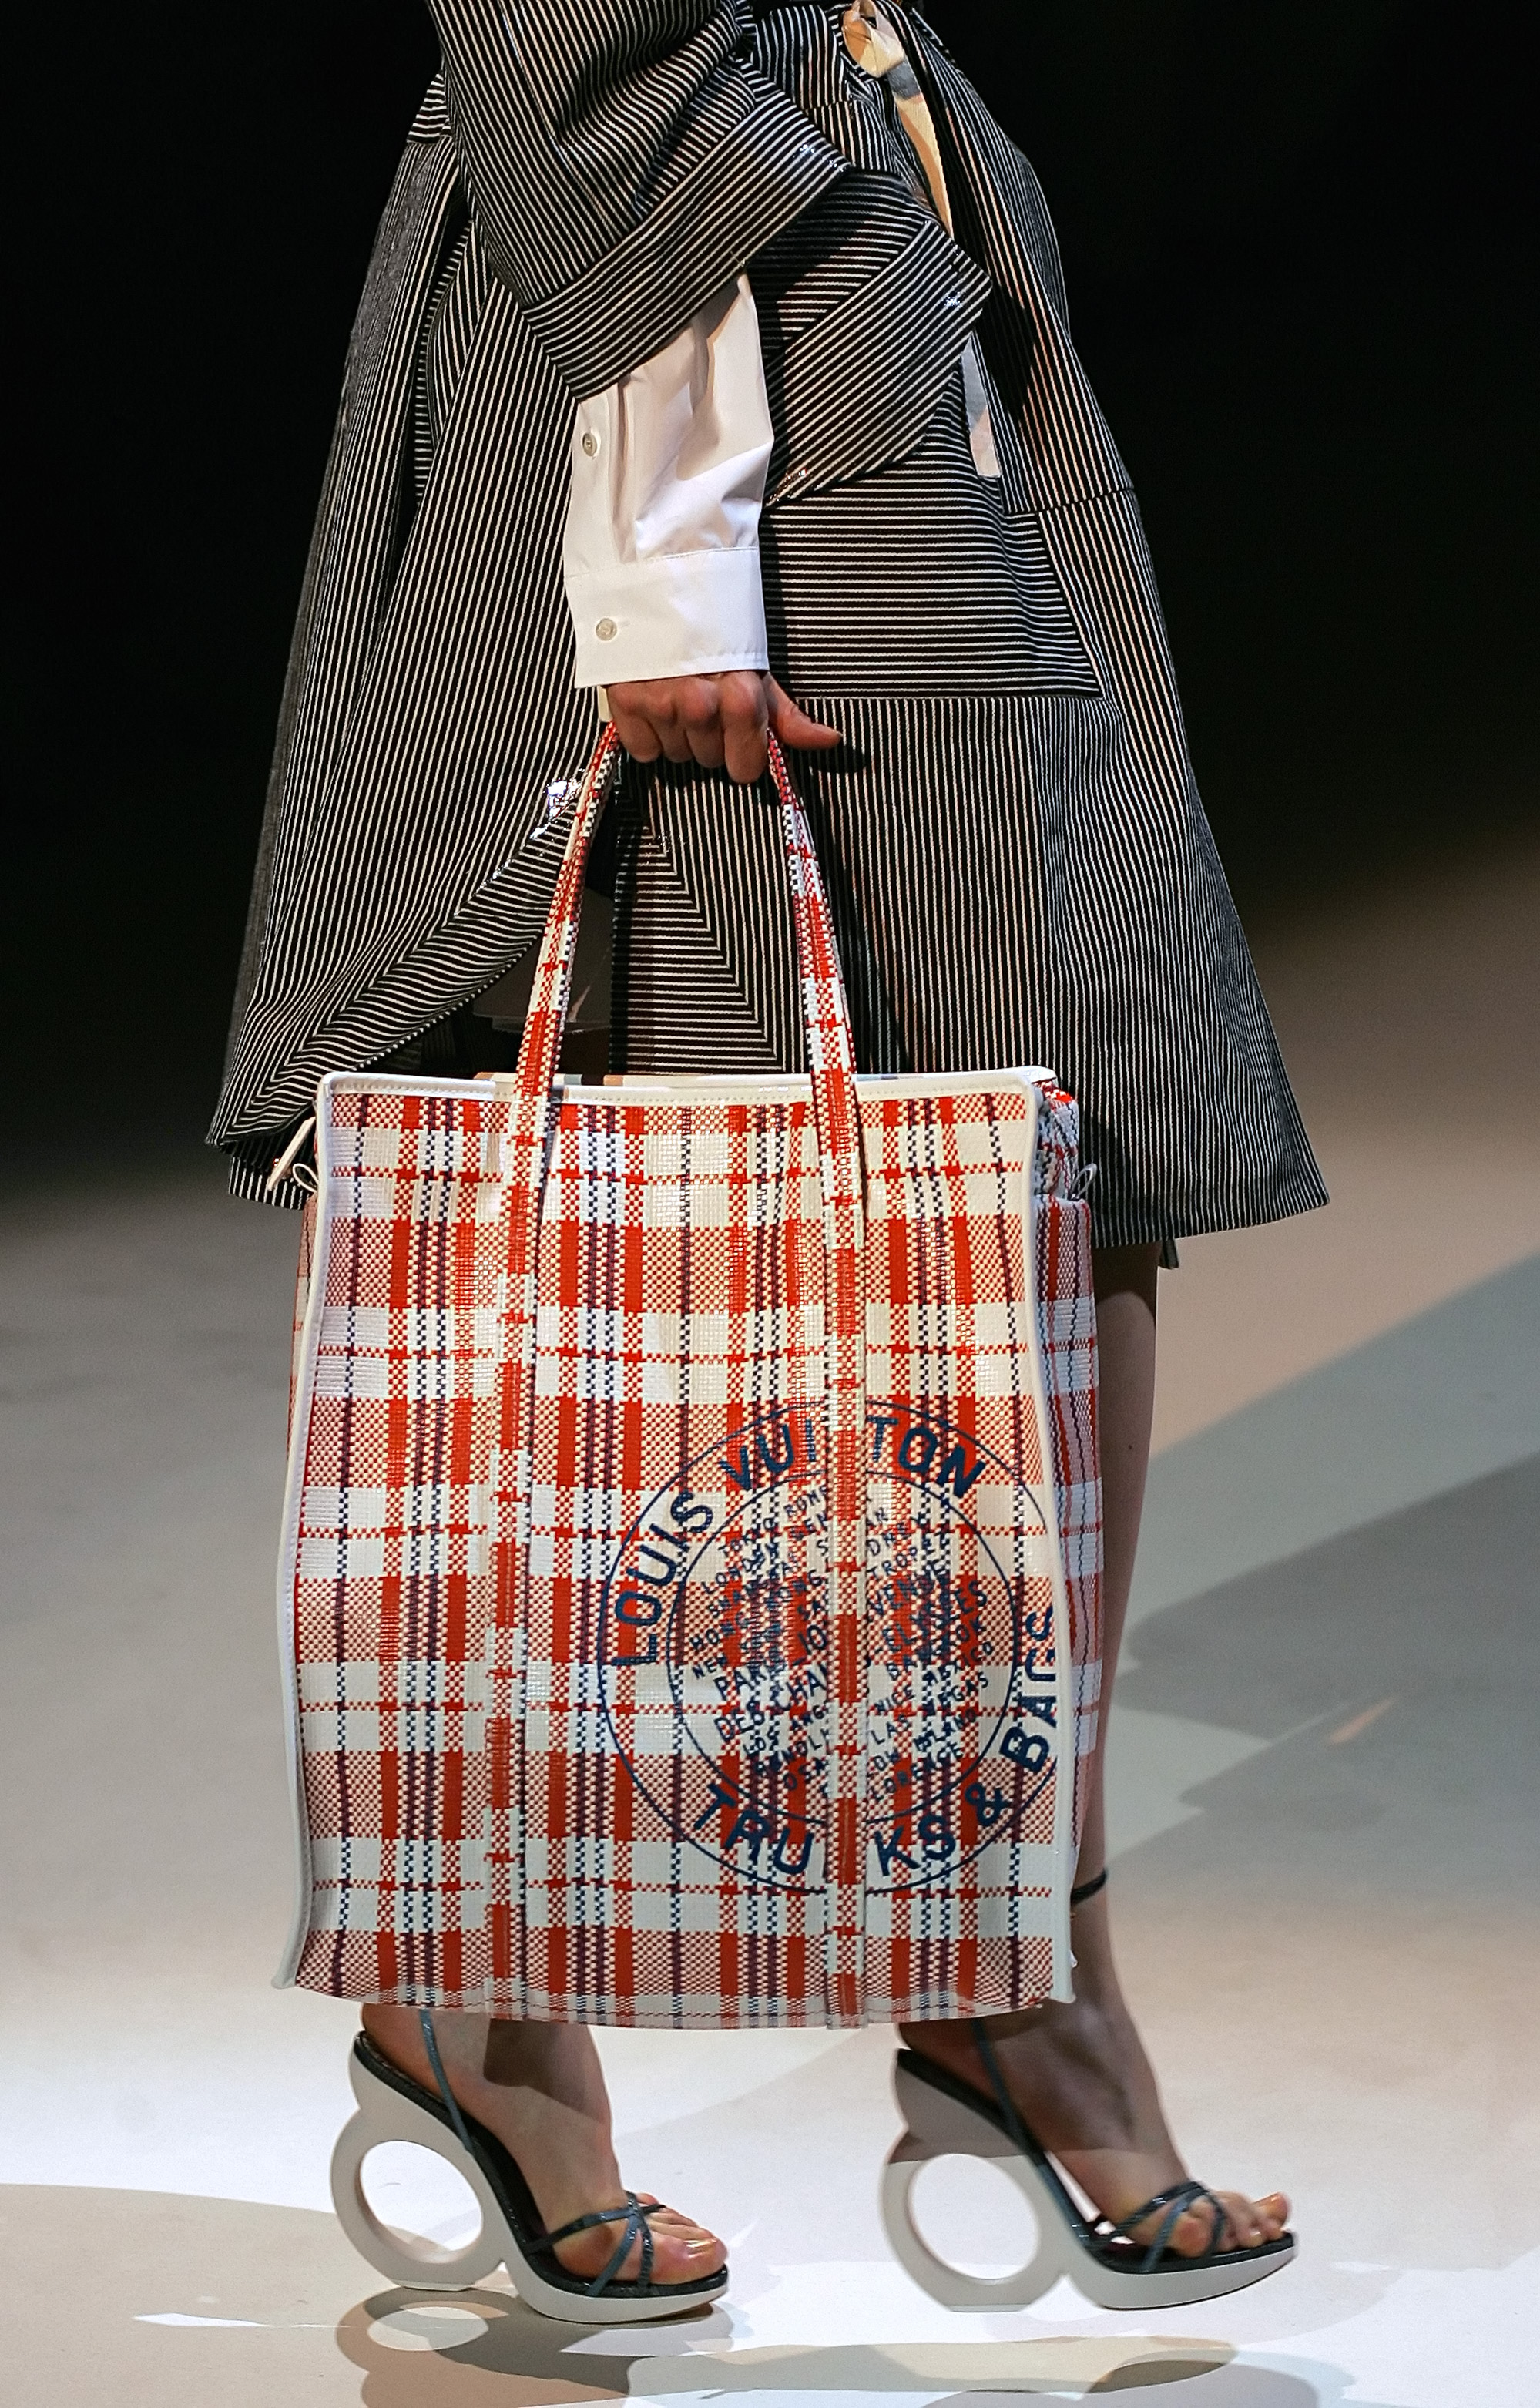 Louis Vuitton Hong Kong red-white-blue nylon canvas bag for Spring/Summer 2007 collection.